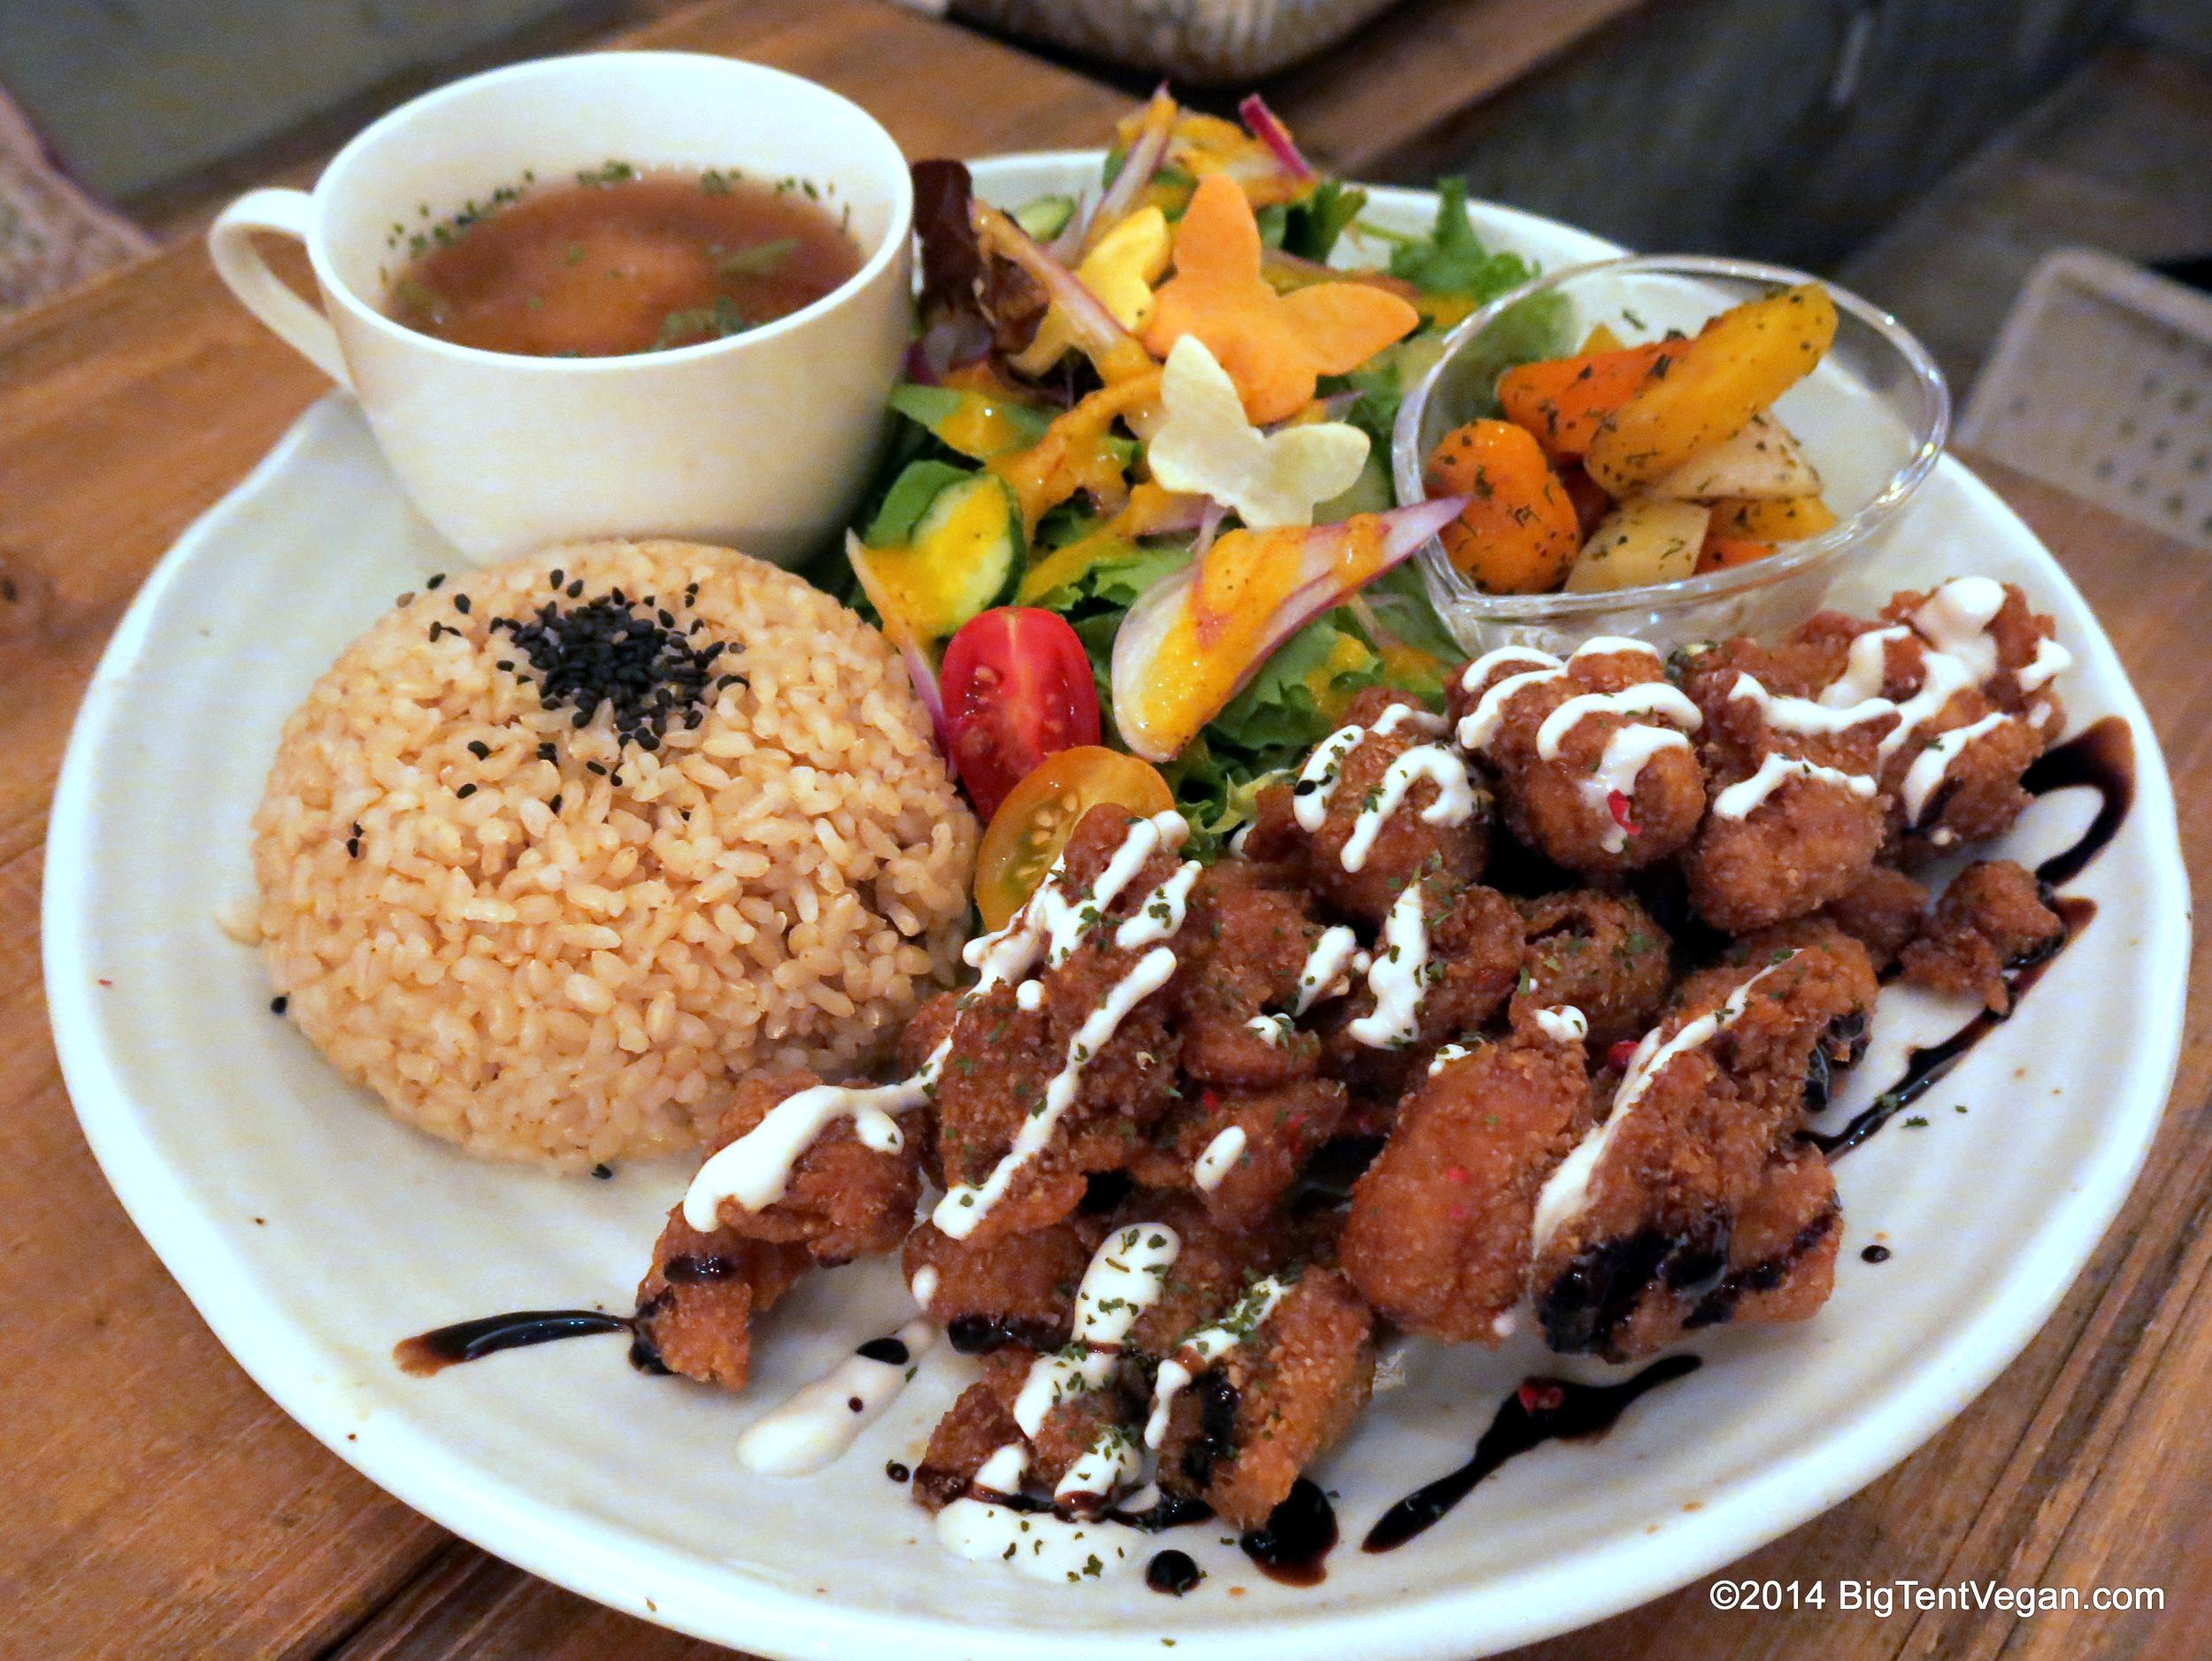 Soy Meat Karaage Dinner from 100% vegan restaurant Paprika Shokudo in Osaka, Japan